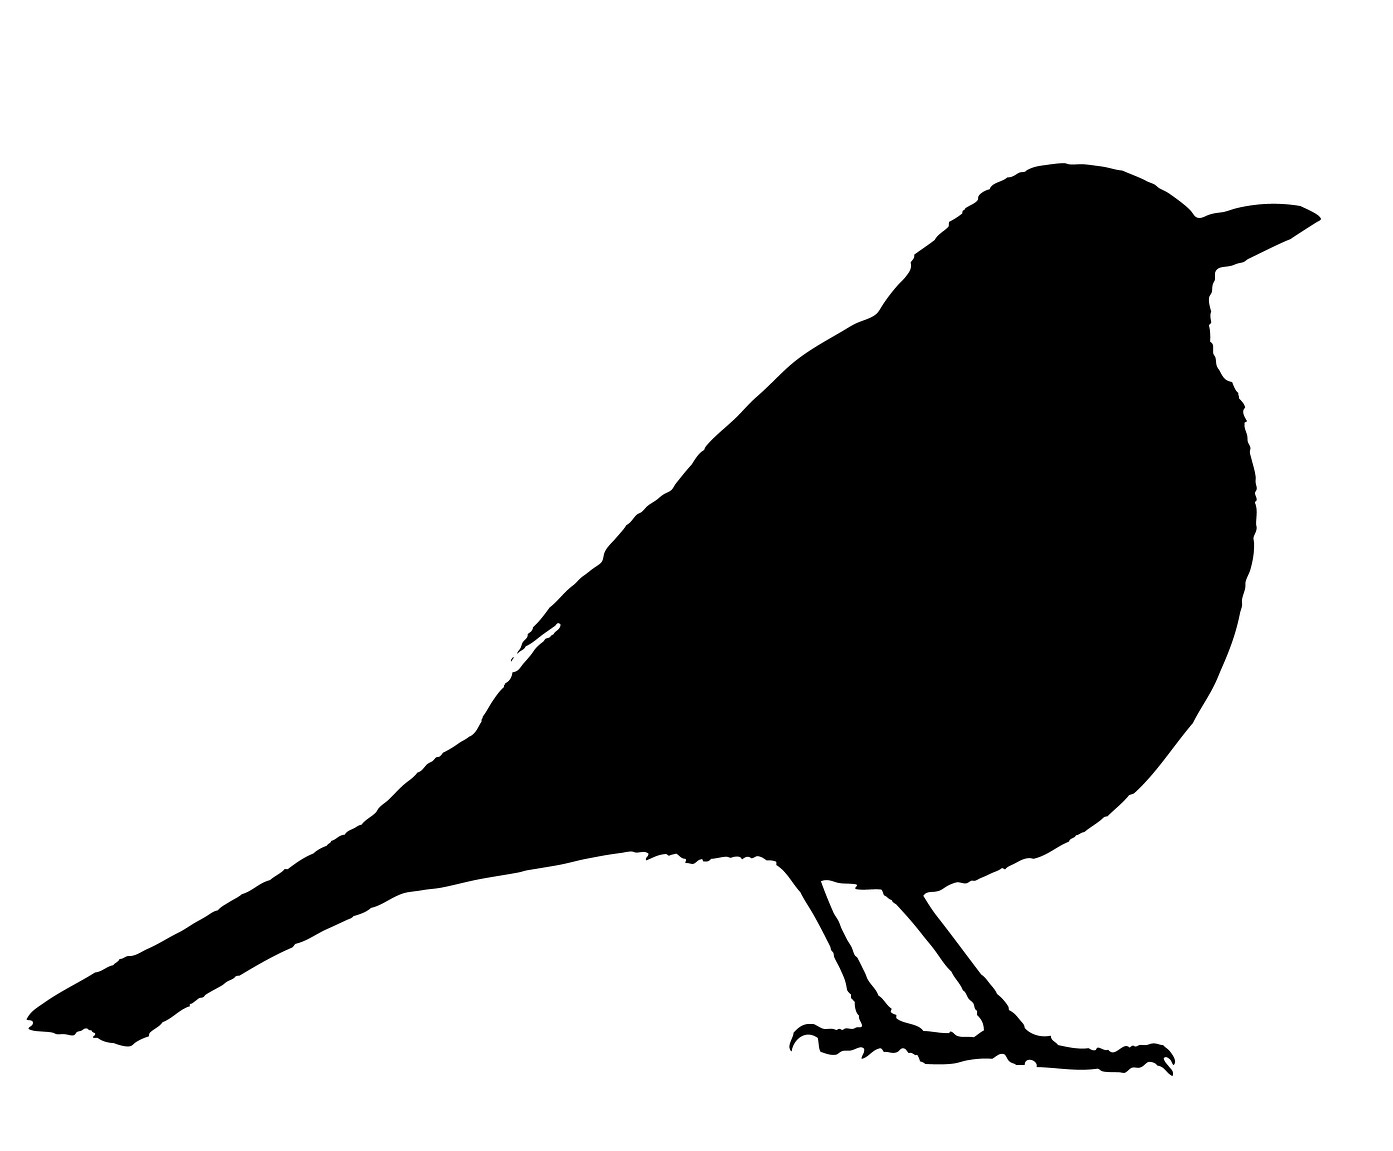 blackbird-2774513_1920.jpg